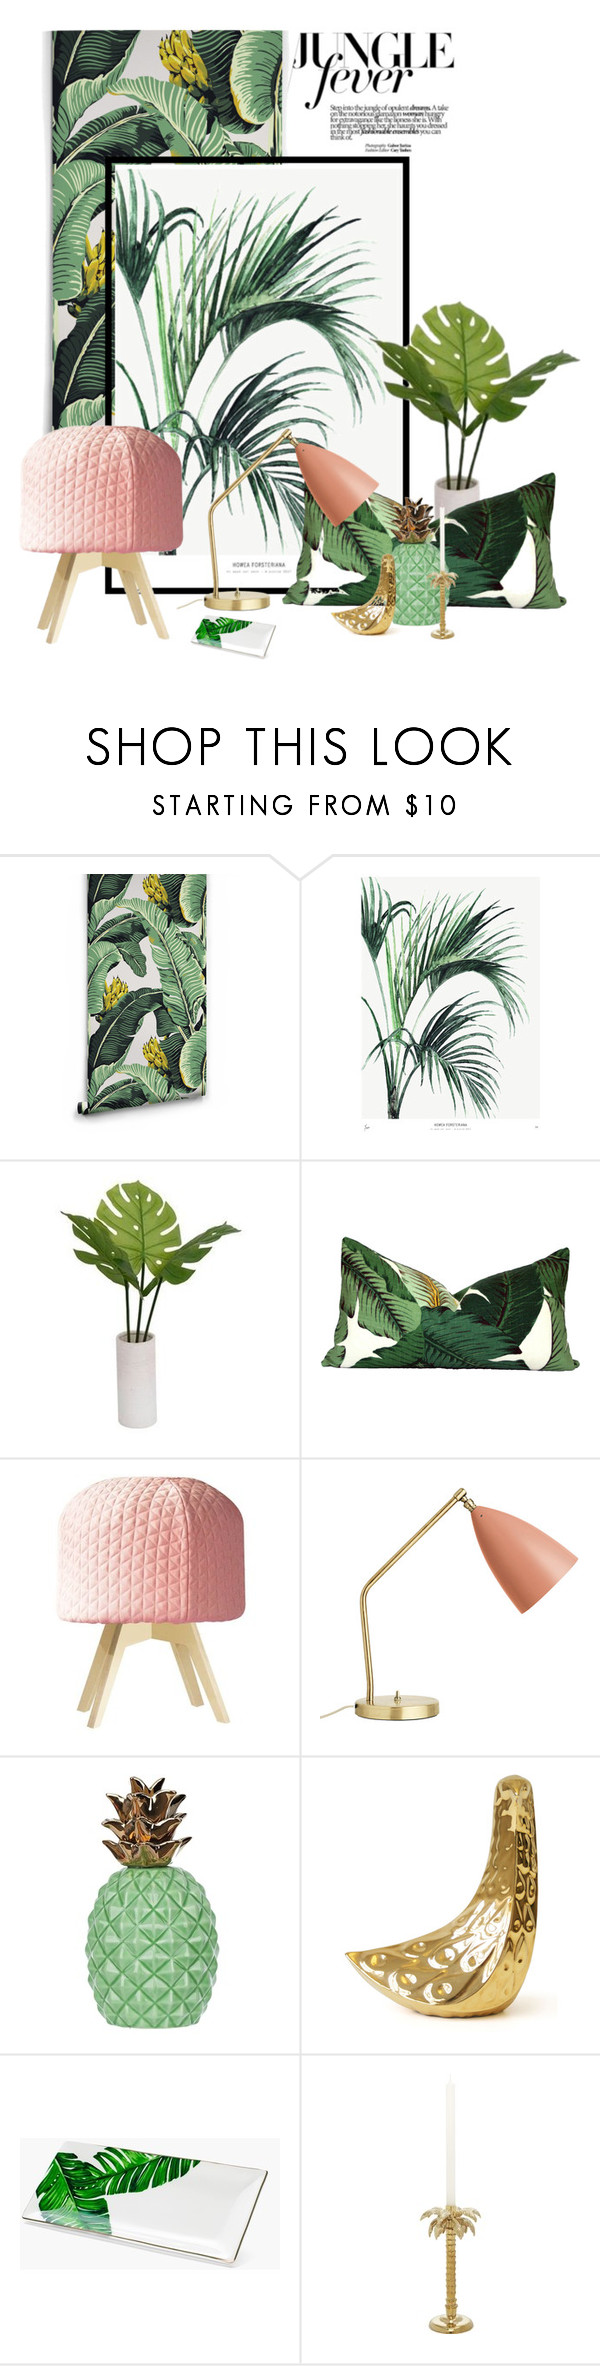 Threshold home decor shop for threshold home decor on polyvore -  Jungle Fever By Saphiralol Liked On Polyvore Featuring Interior Interiors Interior